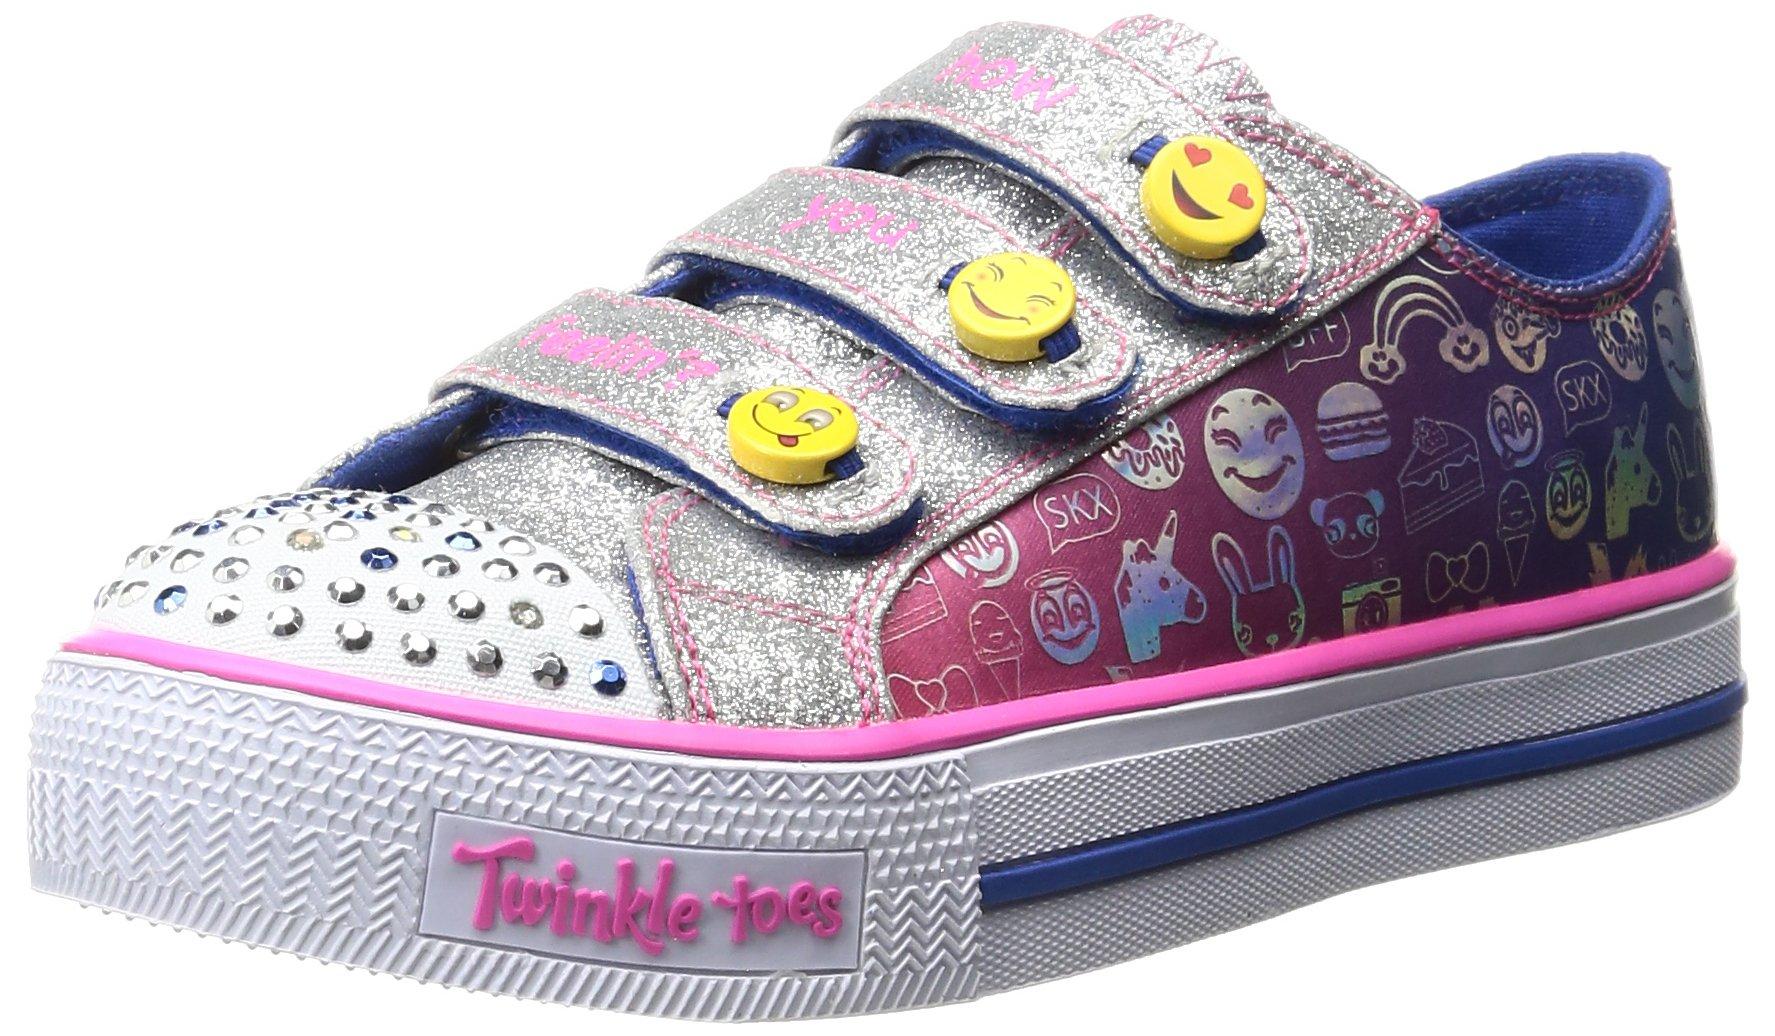 Skechers Big Kid (8-12 Years) Twinkle Toes: Chit Chat-Prolifics Blue-pink Light-Up Sneaker - 4 Big Kid M